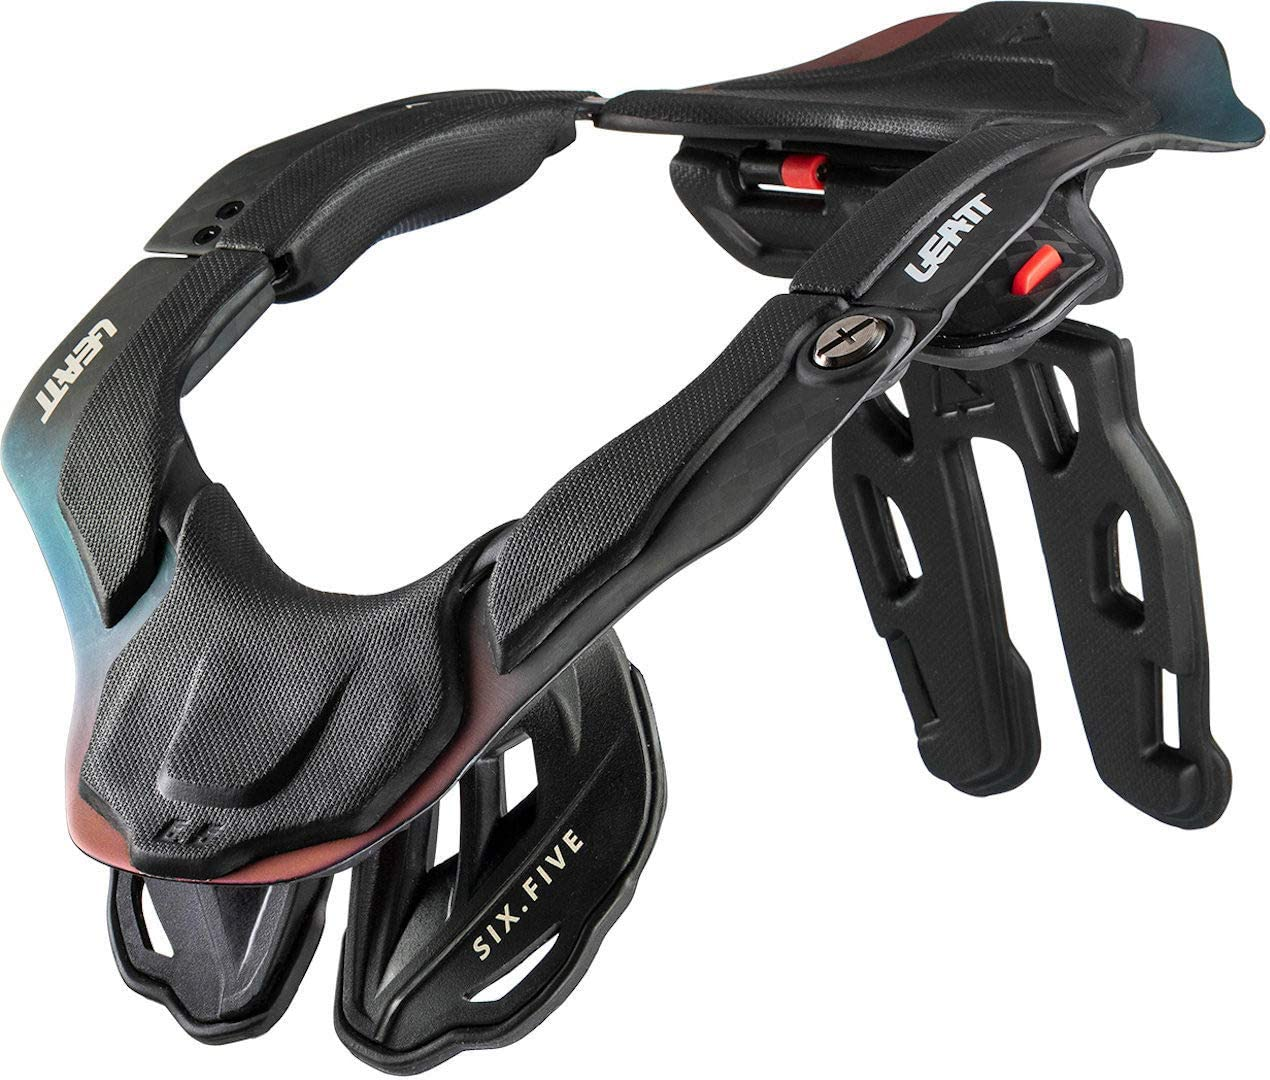 Leatt Dbx 6 5 Neck Protector Carbon Hologram Sport Freizeit